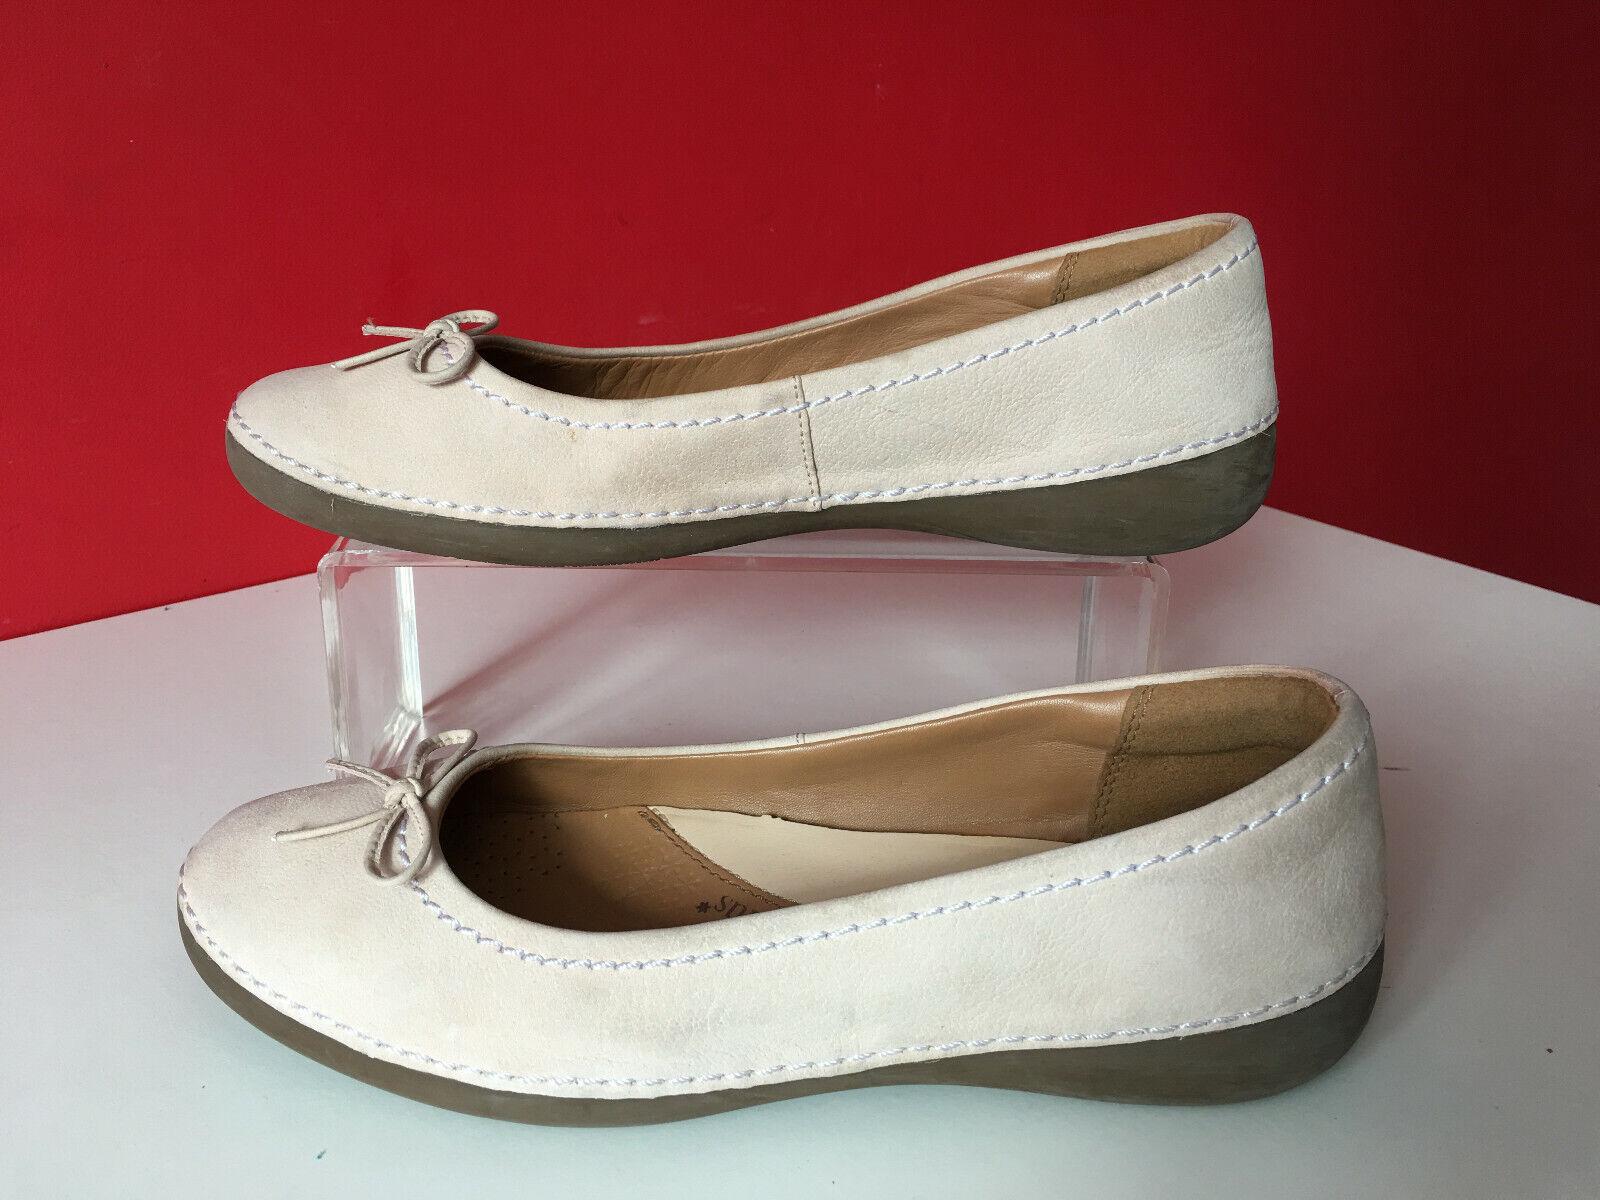 Clarks Plus Beige Leather Comfort Pump Ballet Dolly Flat shoes UK 6 EUR 39